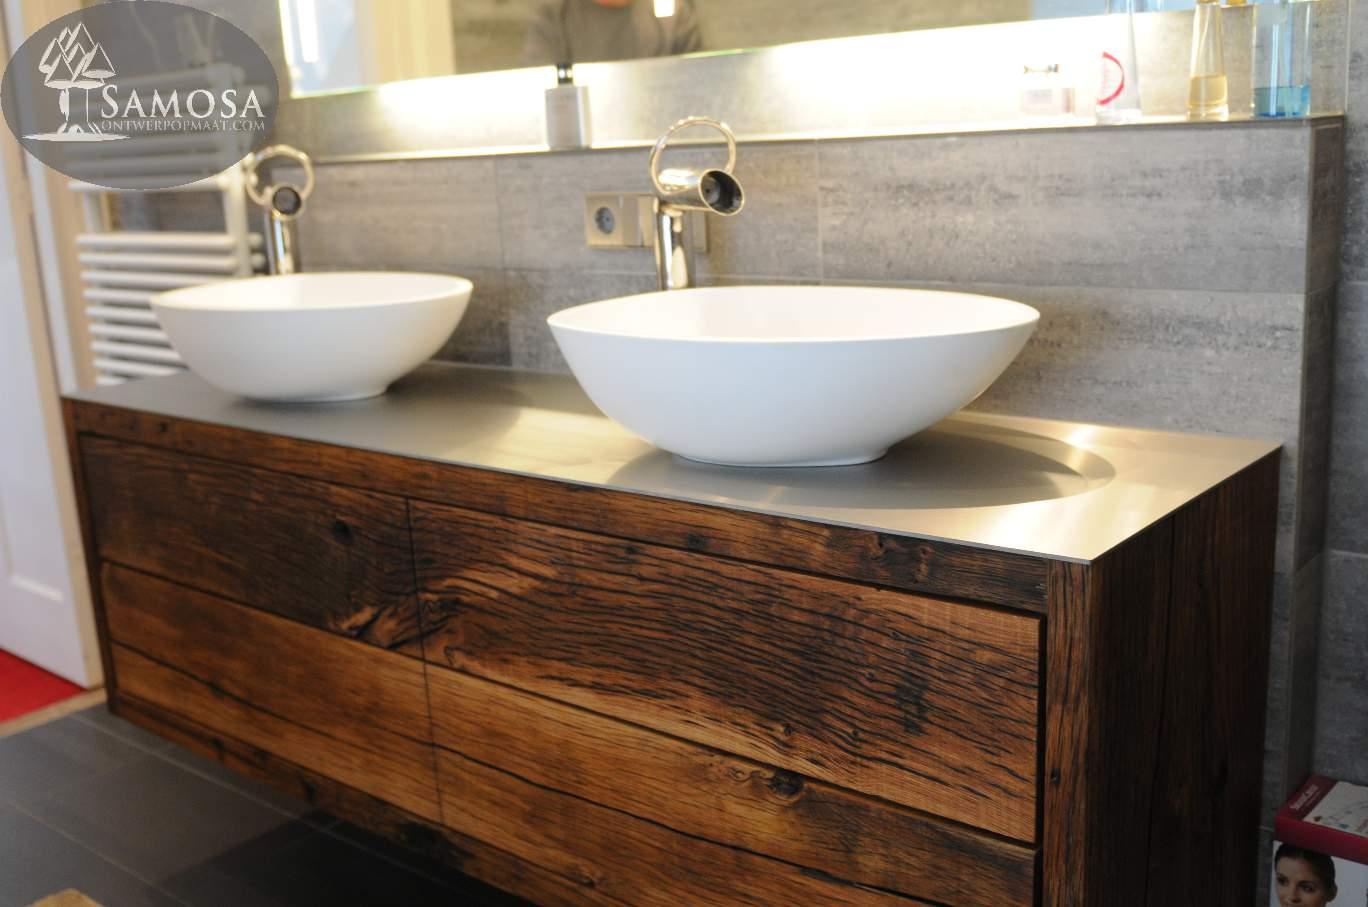 Samosa  Ontwerp op Maat Uniek badkamer meubel  Samosa